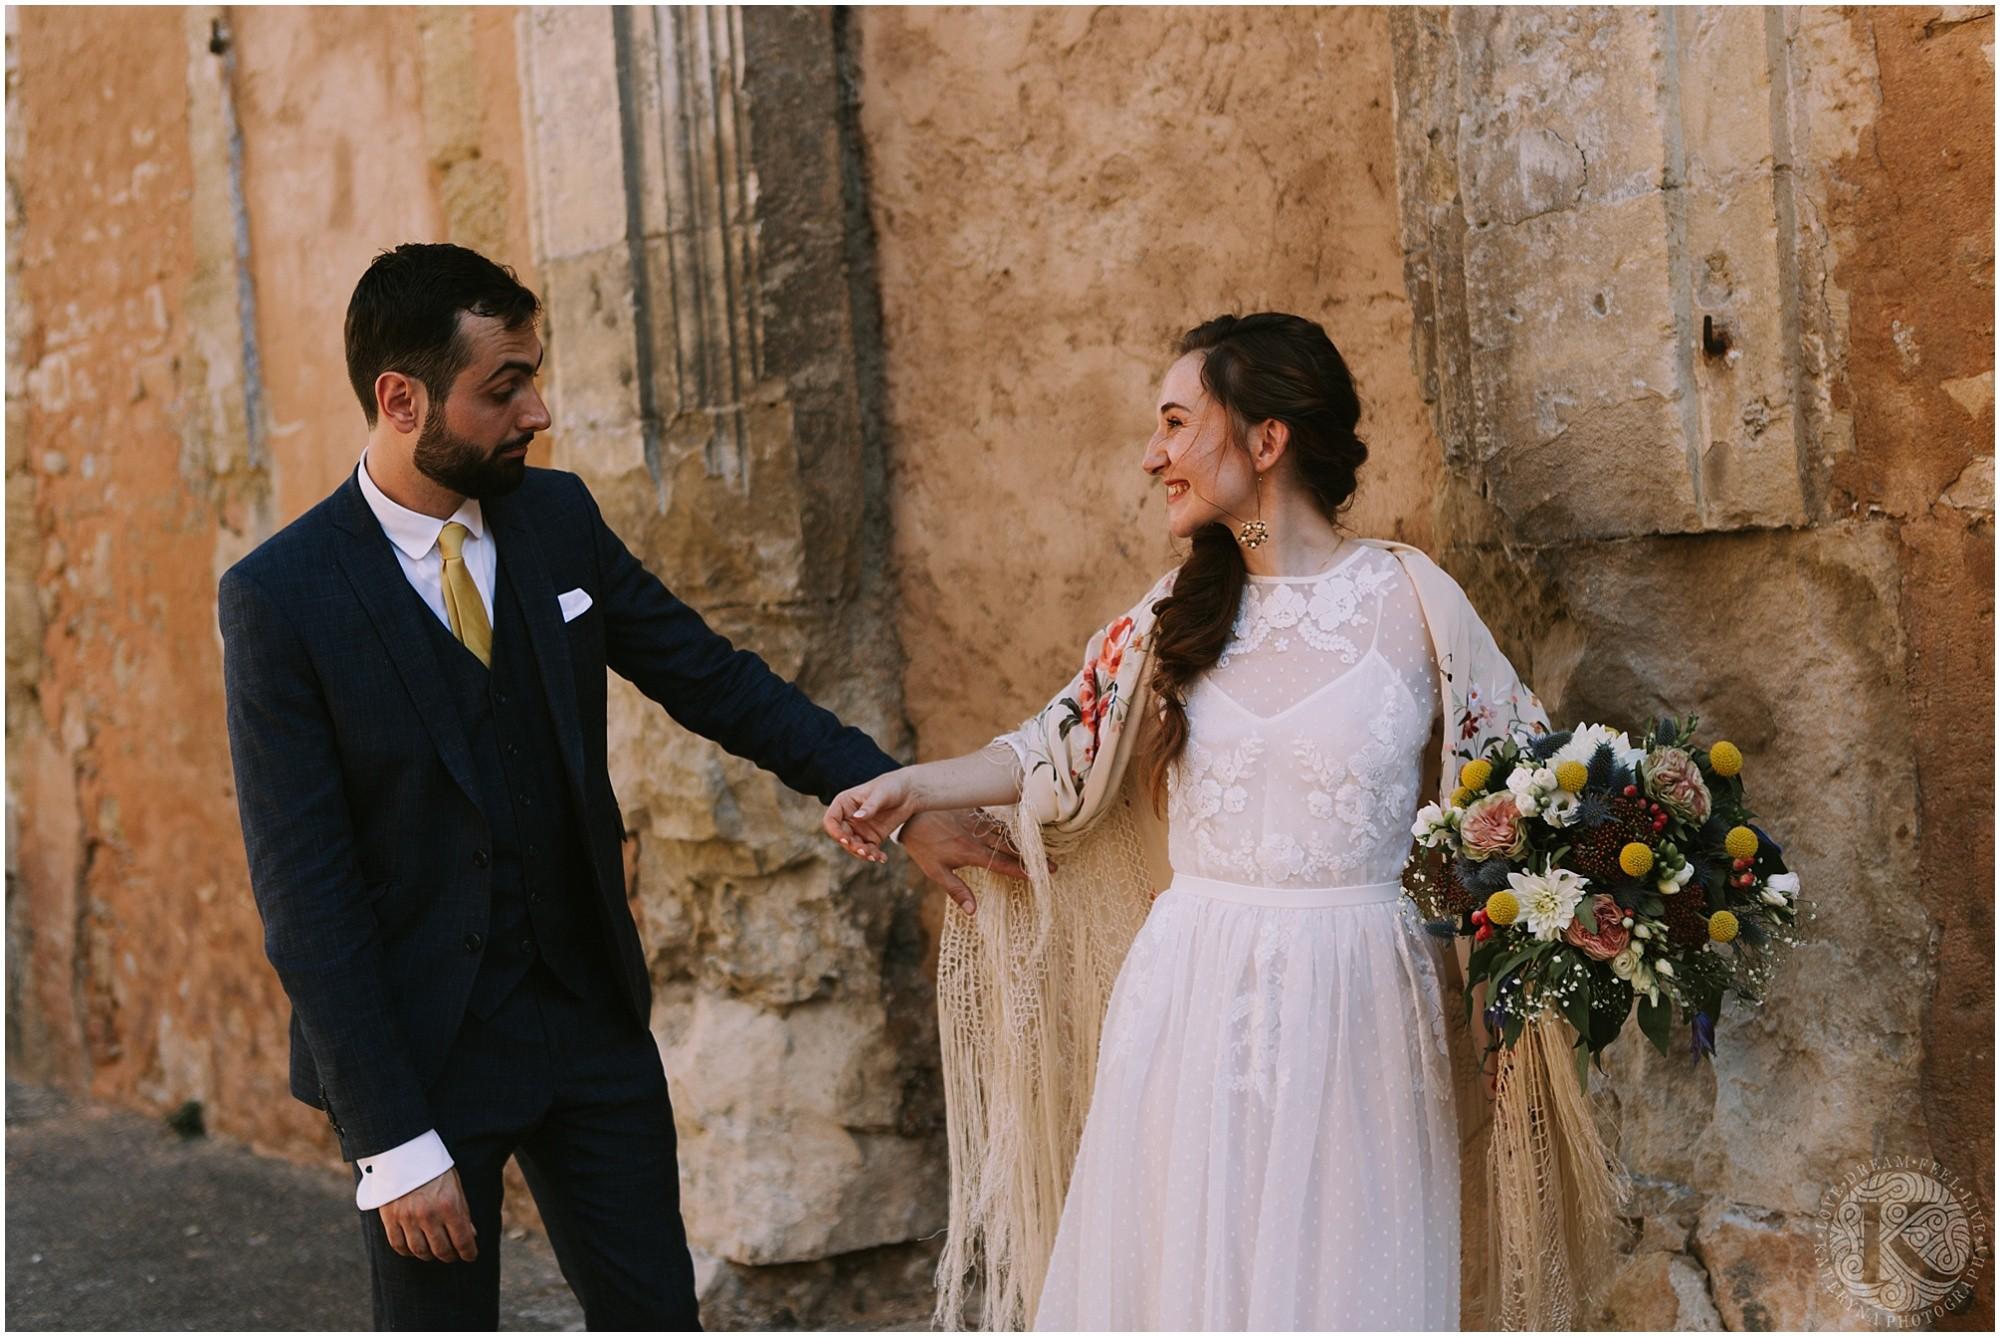 Kateryna-photos-photographe-mariage-vaucluse-provence-avignon-ferme-st-hugues_0042.jpg